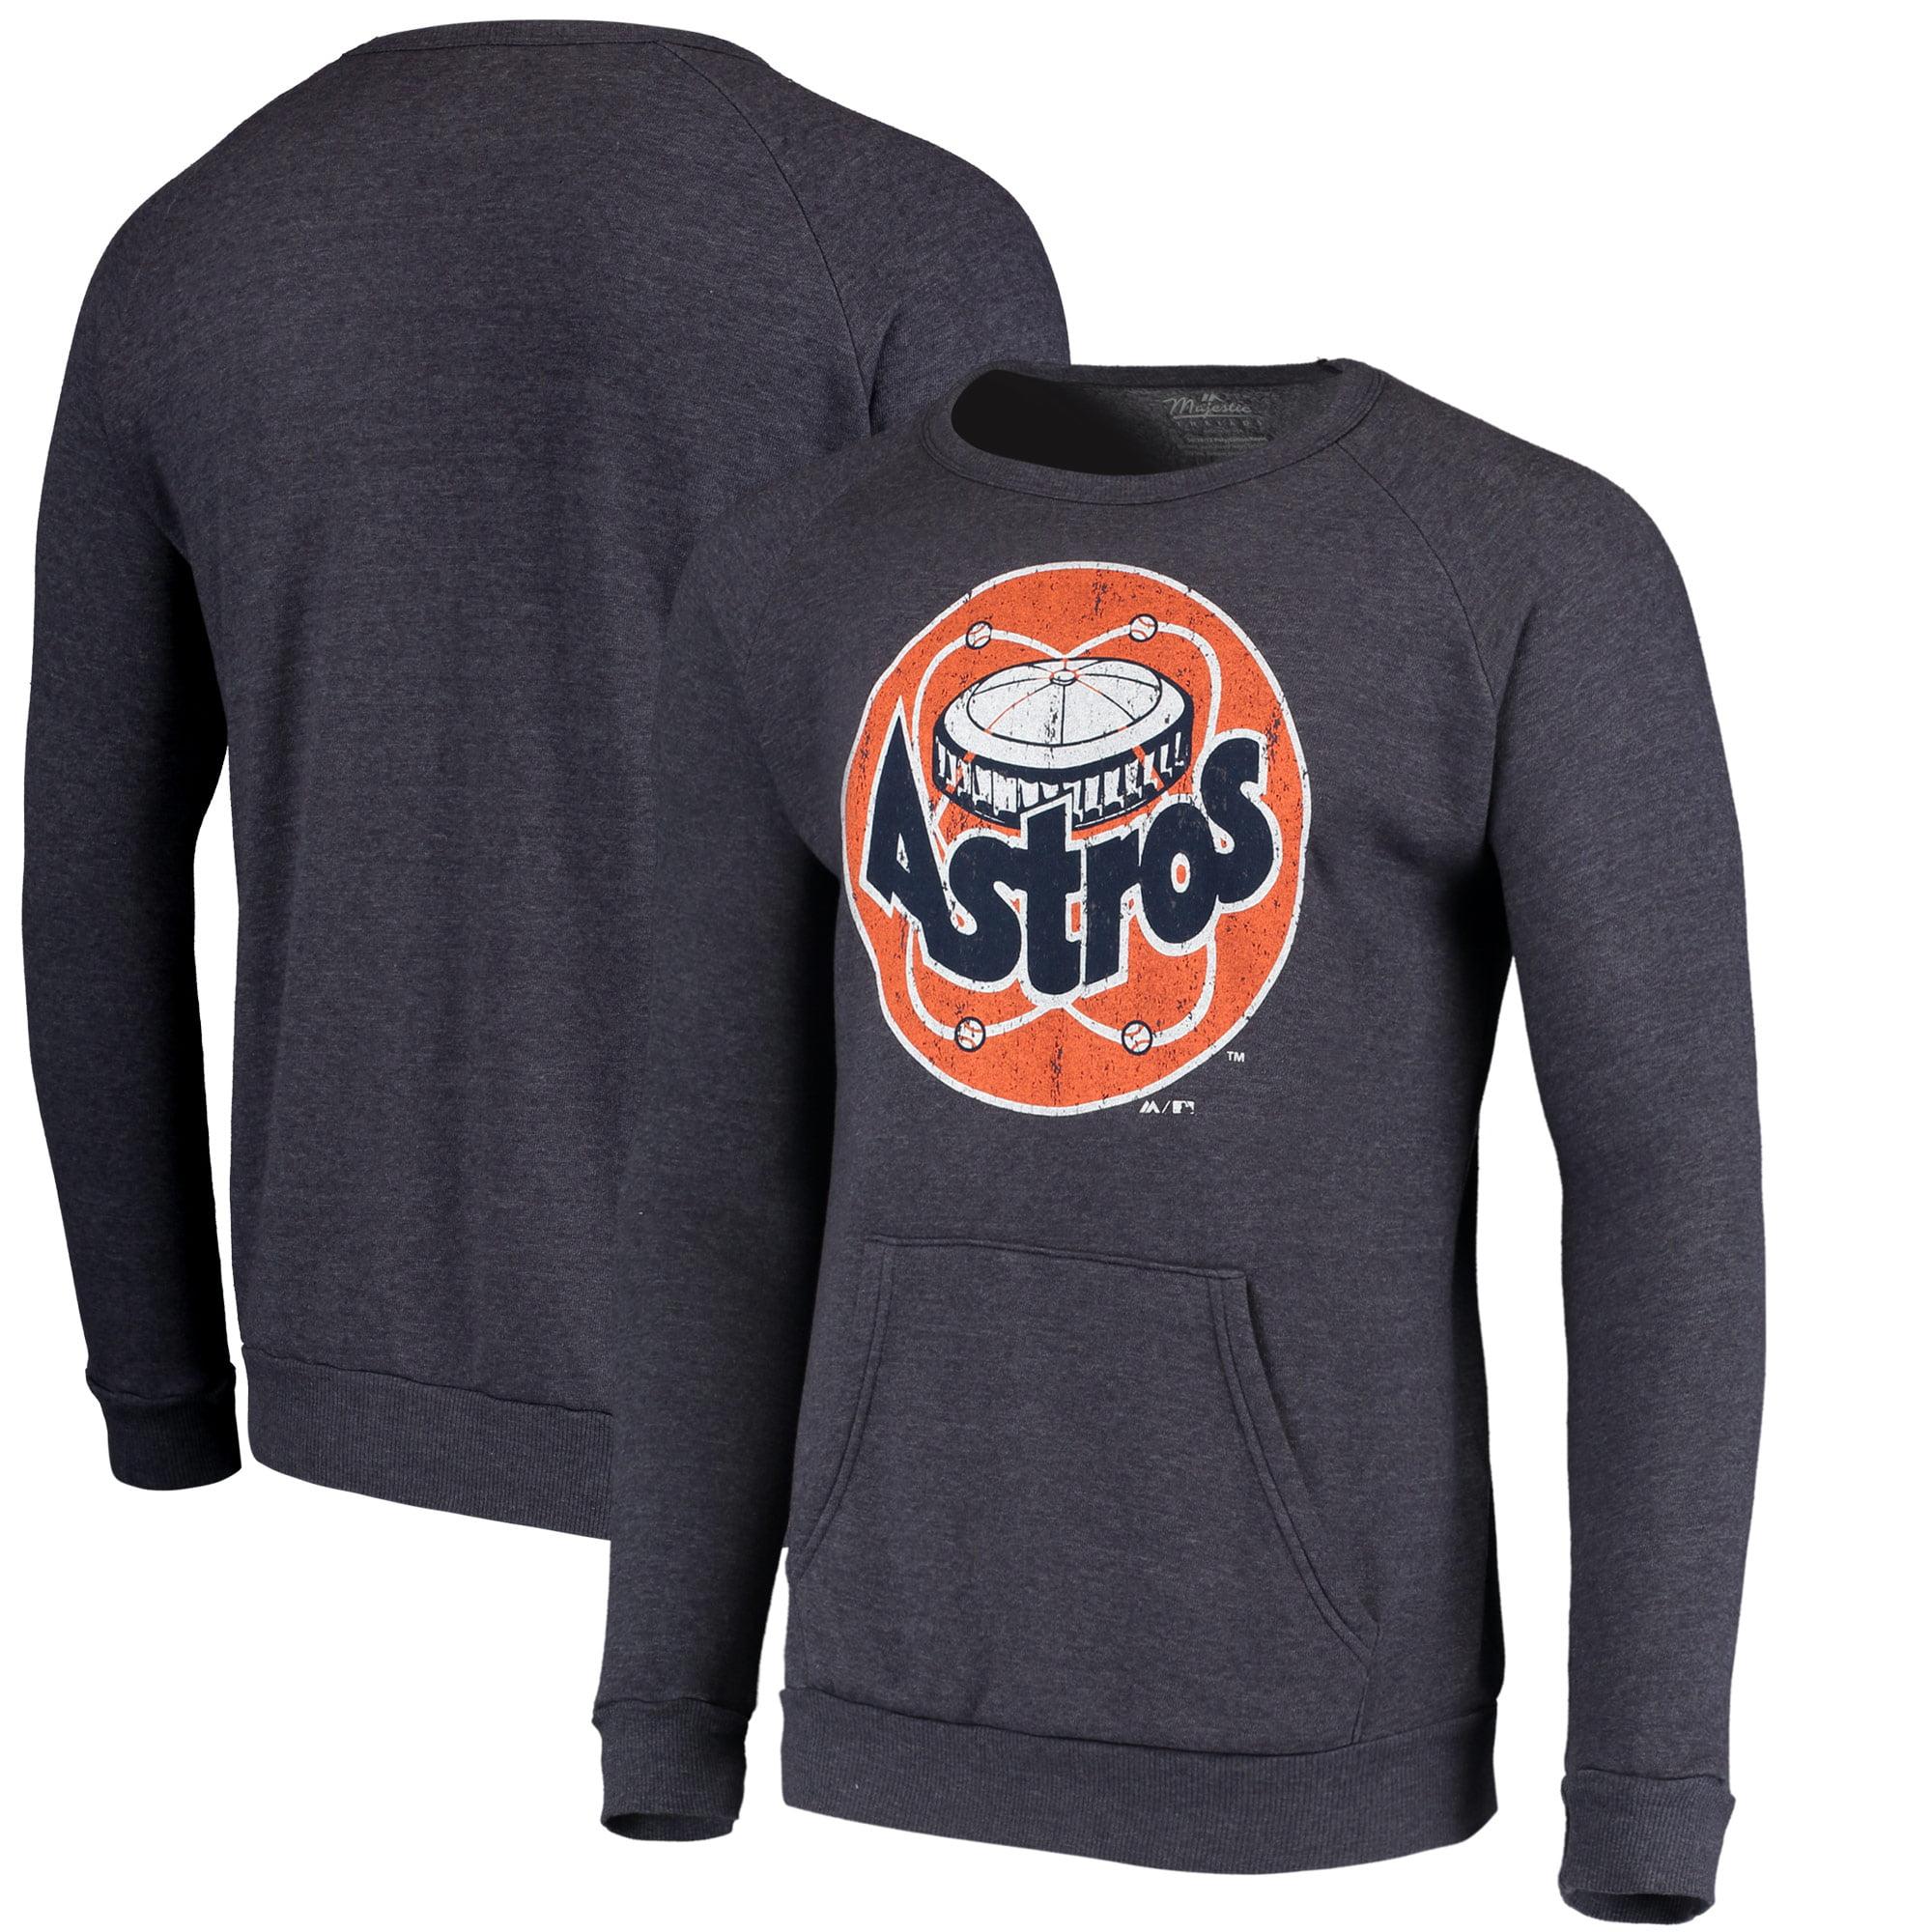 Houston Astros Majestic Threads Cooperstown Collection Tri-Blend Pocket Fleece Sweatshirt - Navy